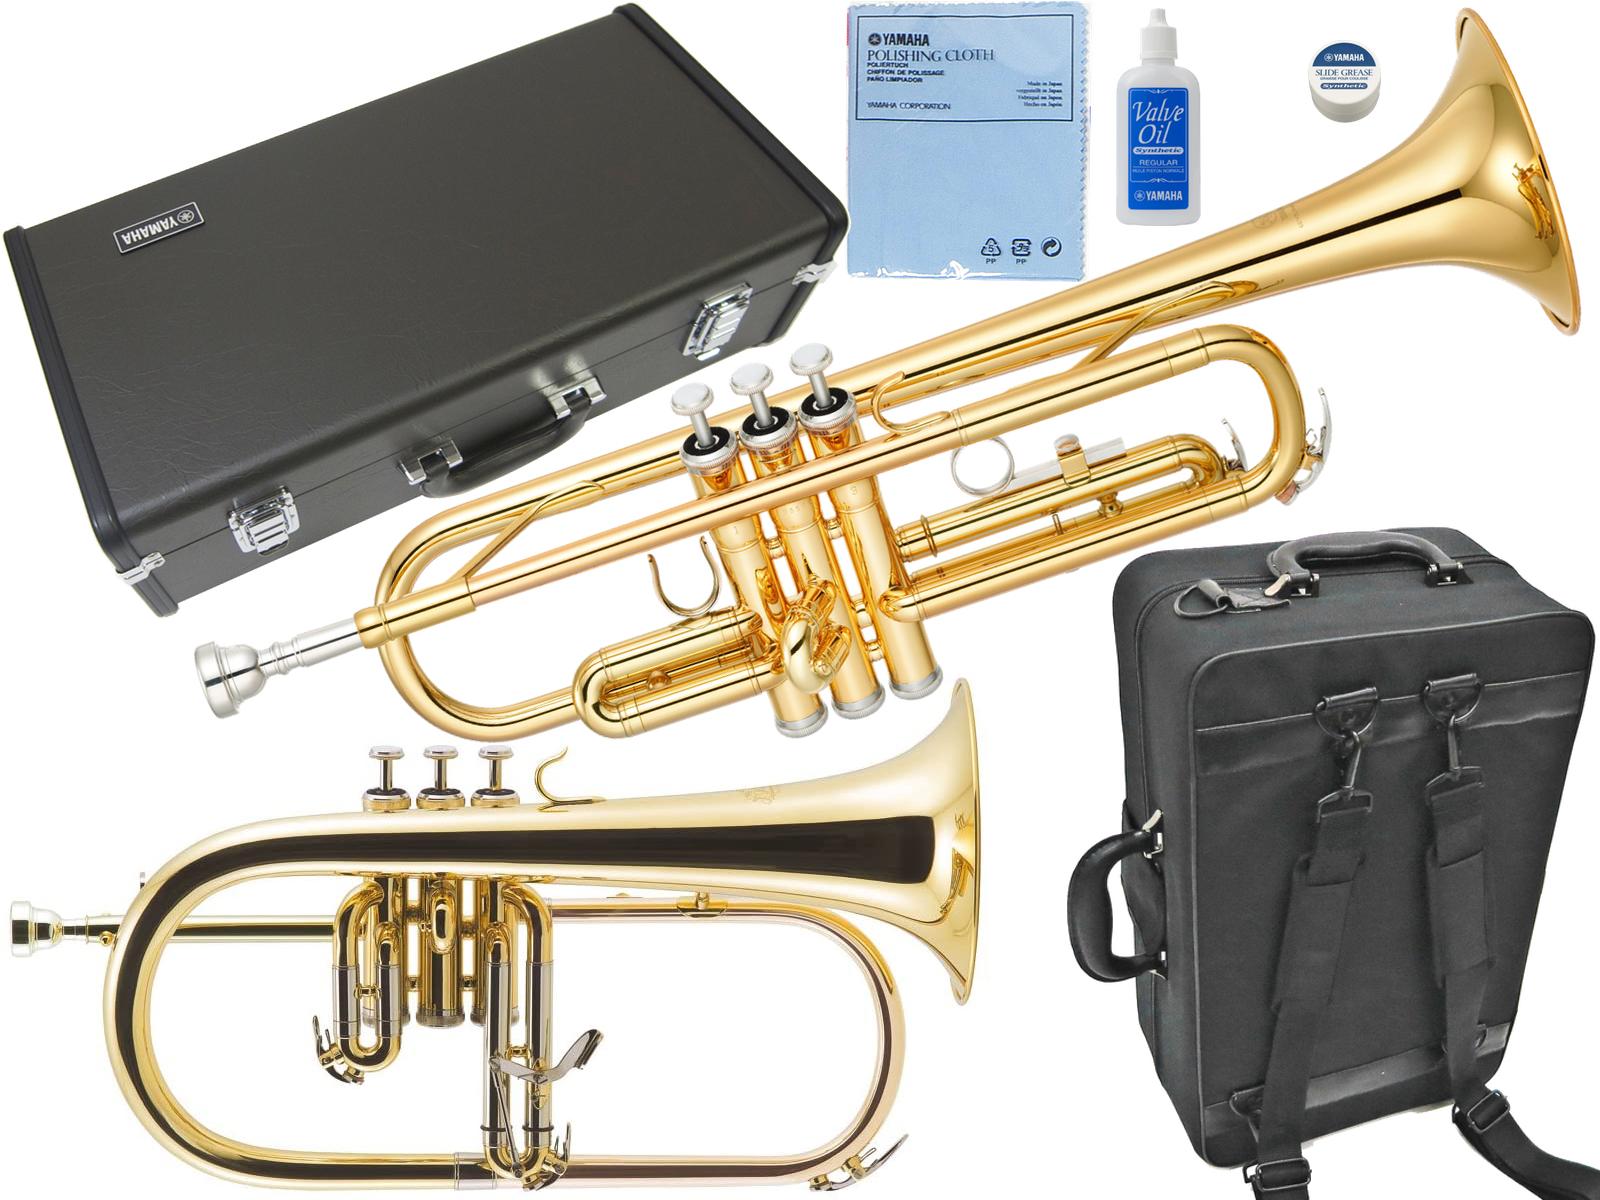 YAMAHA ( ヤマハ ) YTR-2330 トランペット 正規品 ゴールド 管楽器 B♭Trumpets YTR-2330-01 Jマイケル フリューゲルホルン FG-500 セット 北海道 沖縄 離島不可